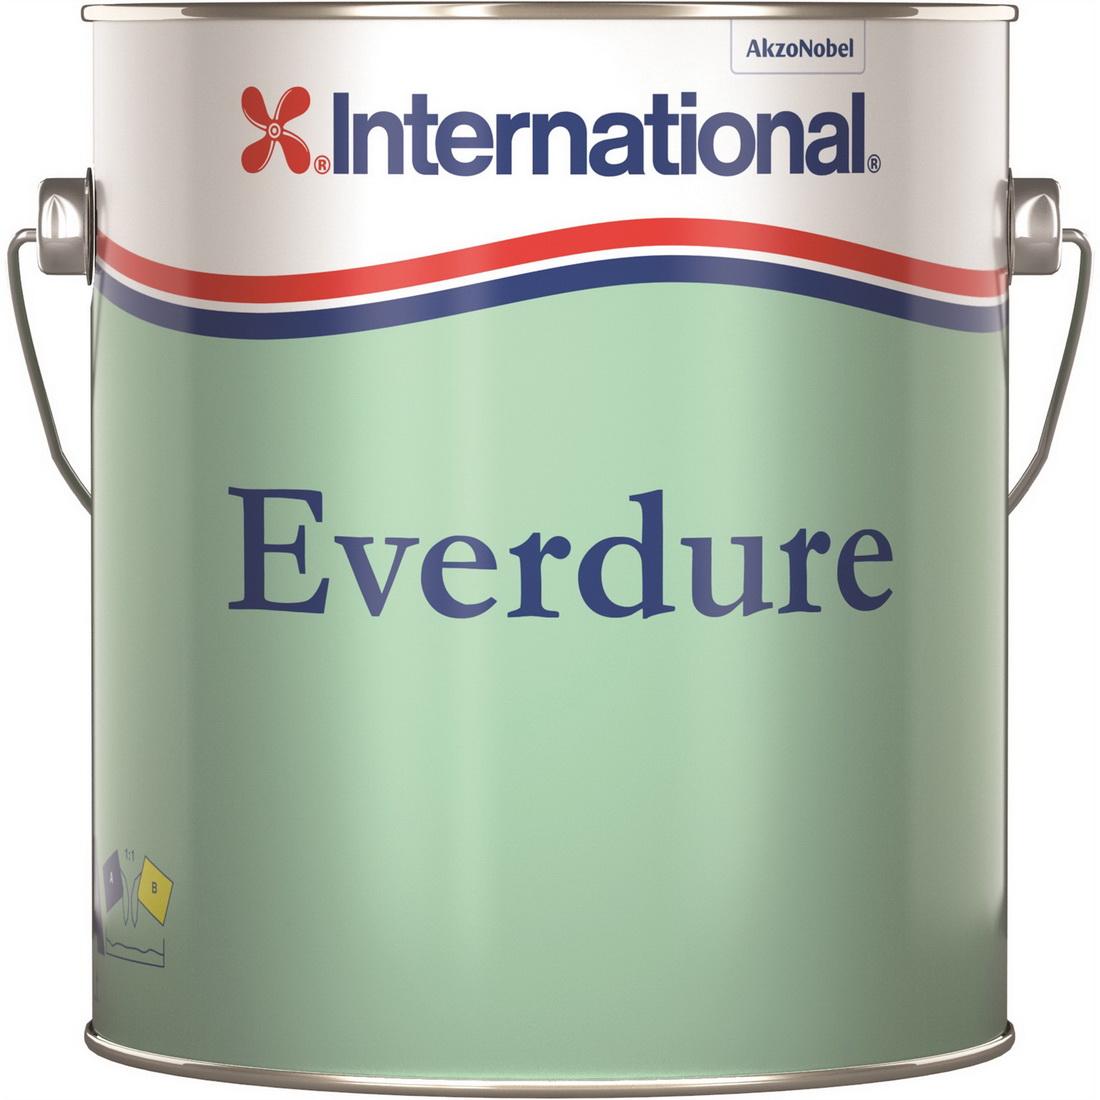 International 500mL Everdure Kit Gloss